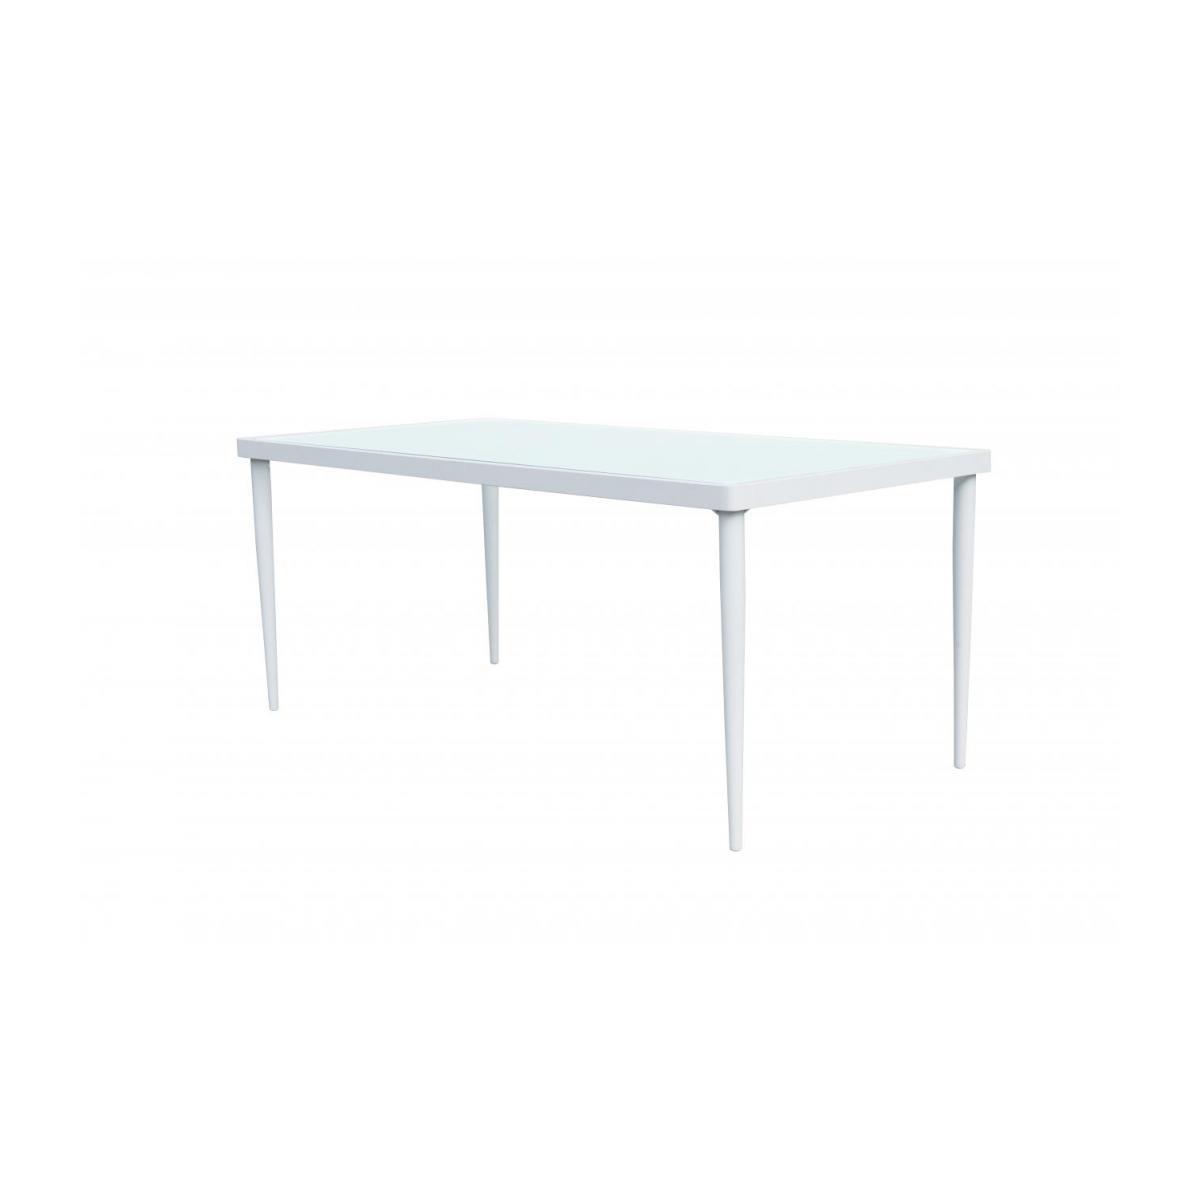 Table De Jardin En Aluminium Et Verre Trempé - Blanc encequiconcerne Table De Jardin Aluminium Et Verre